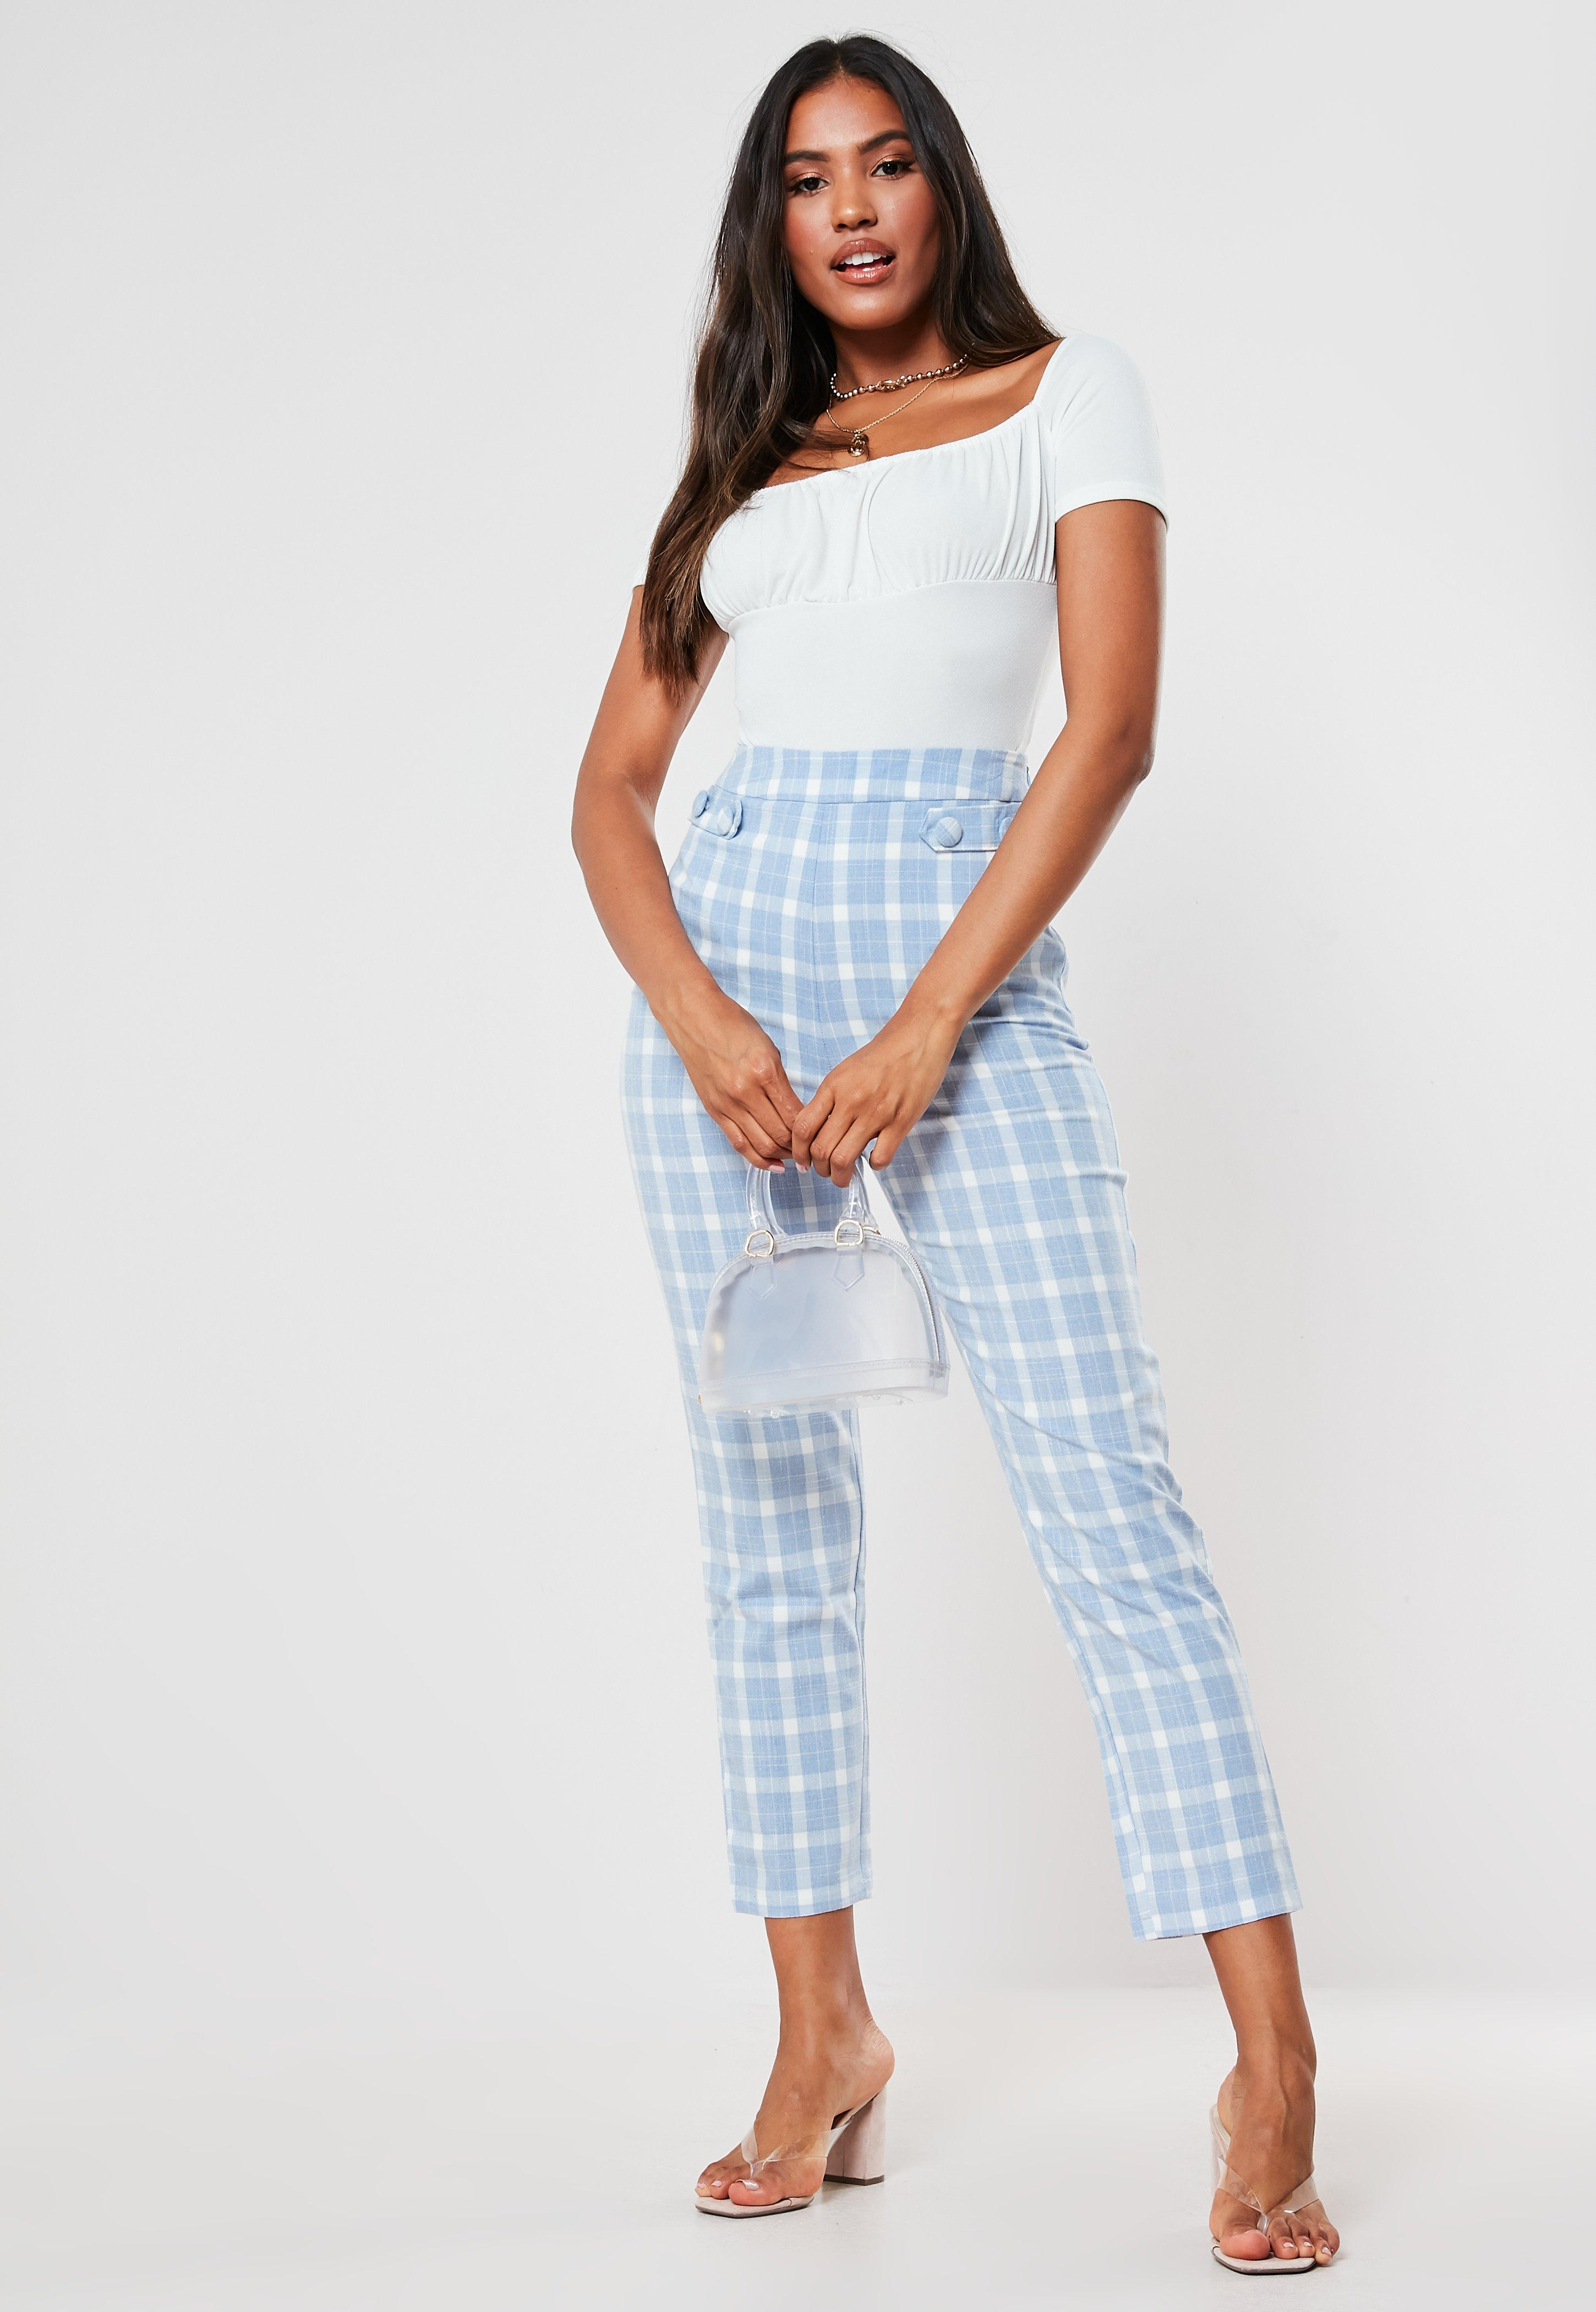 aac24f7d Pants | Women's Pants & Slacks - Missguided